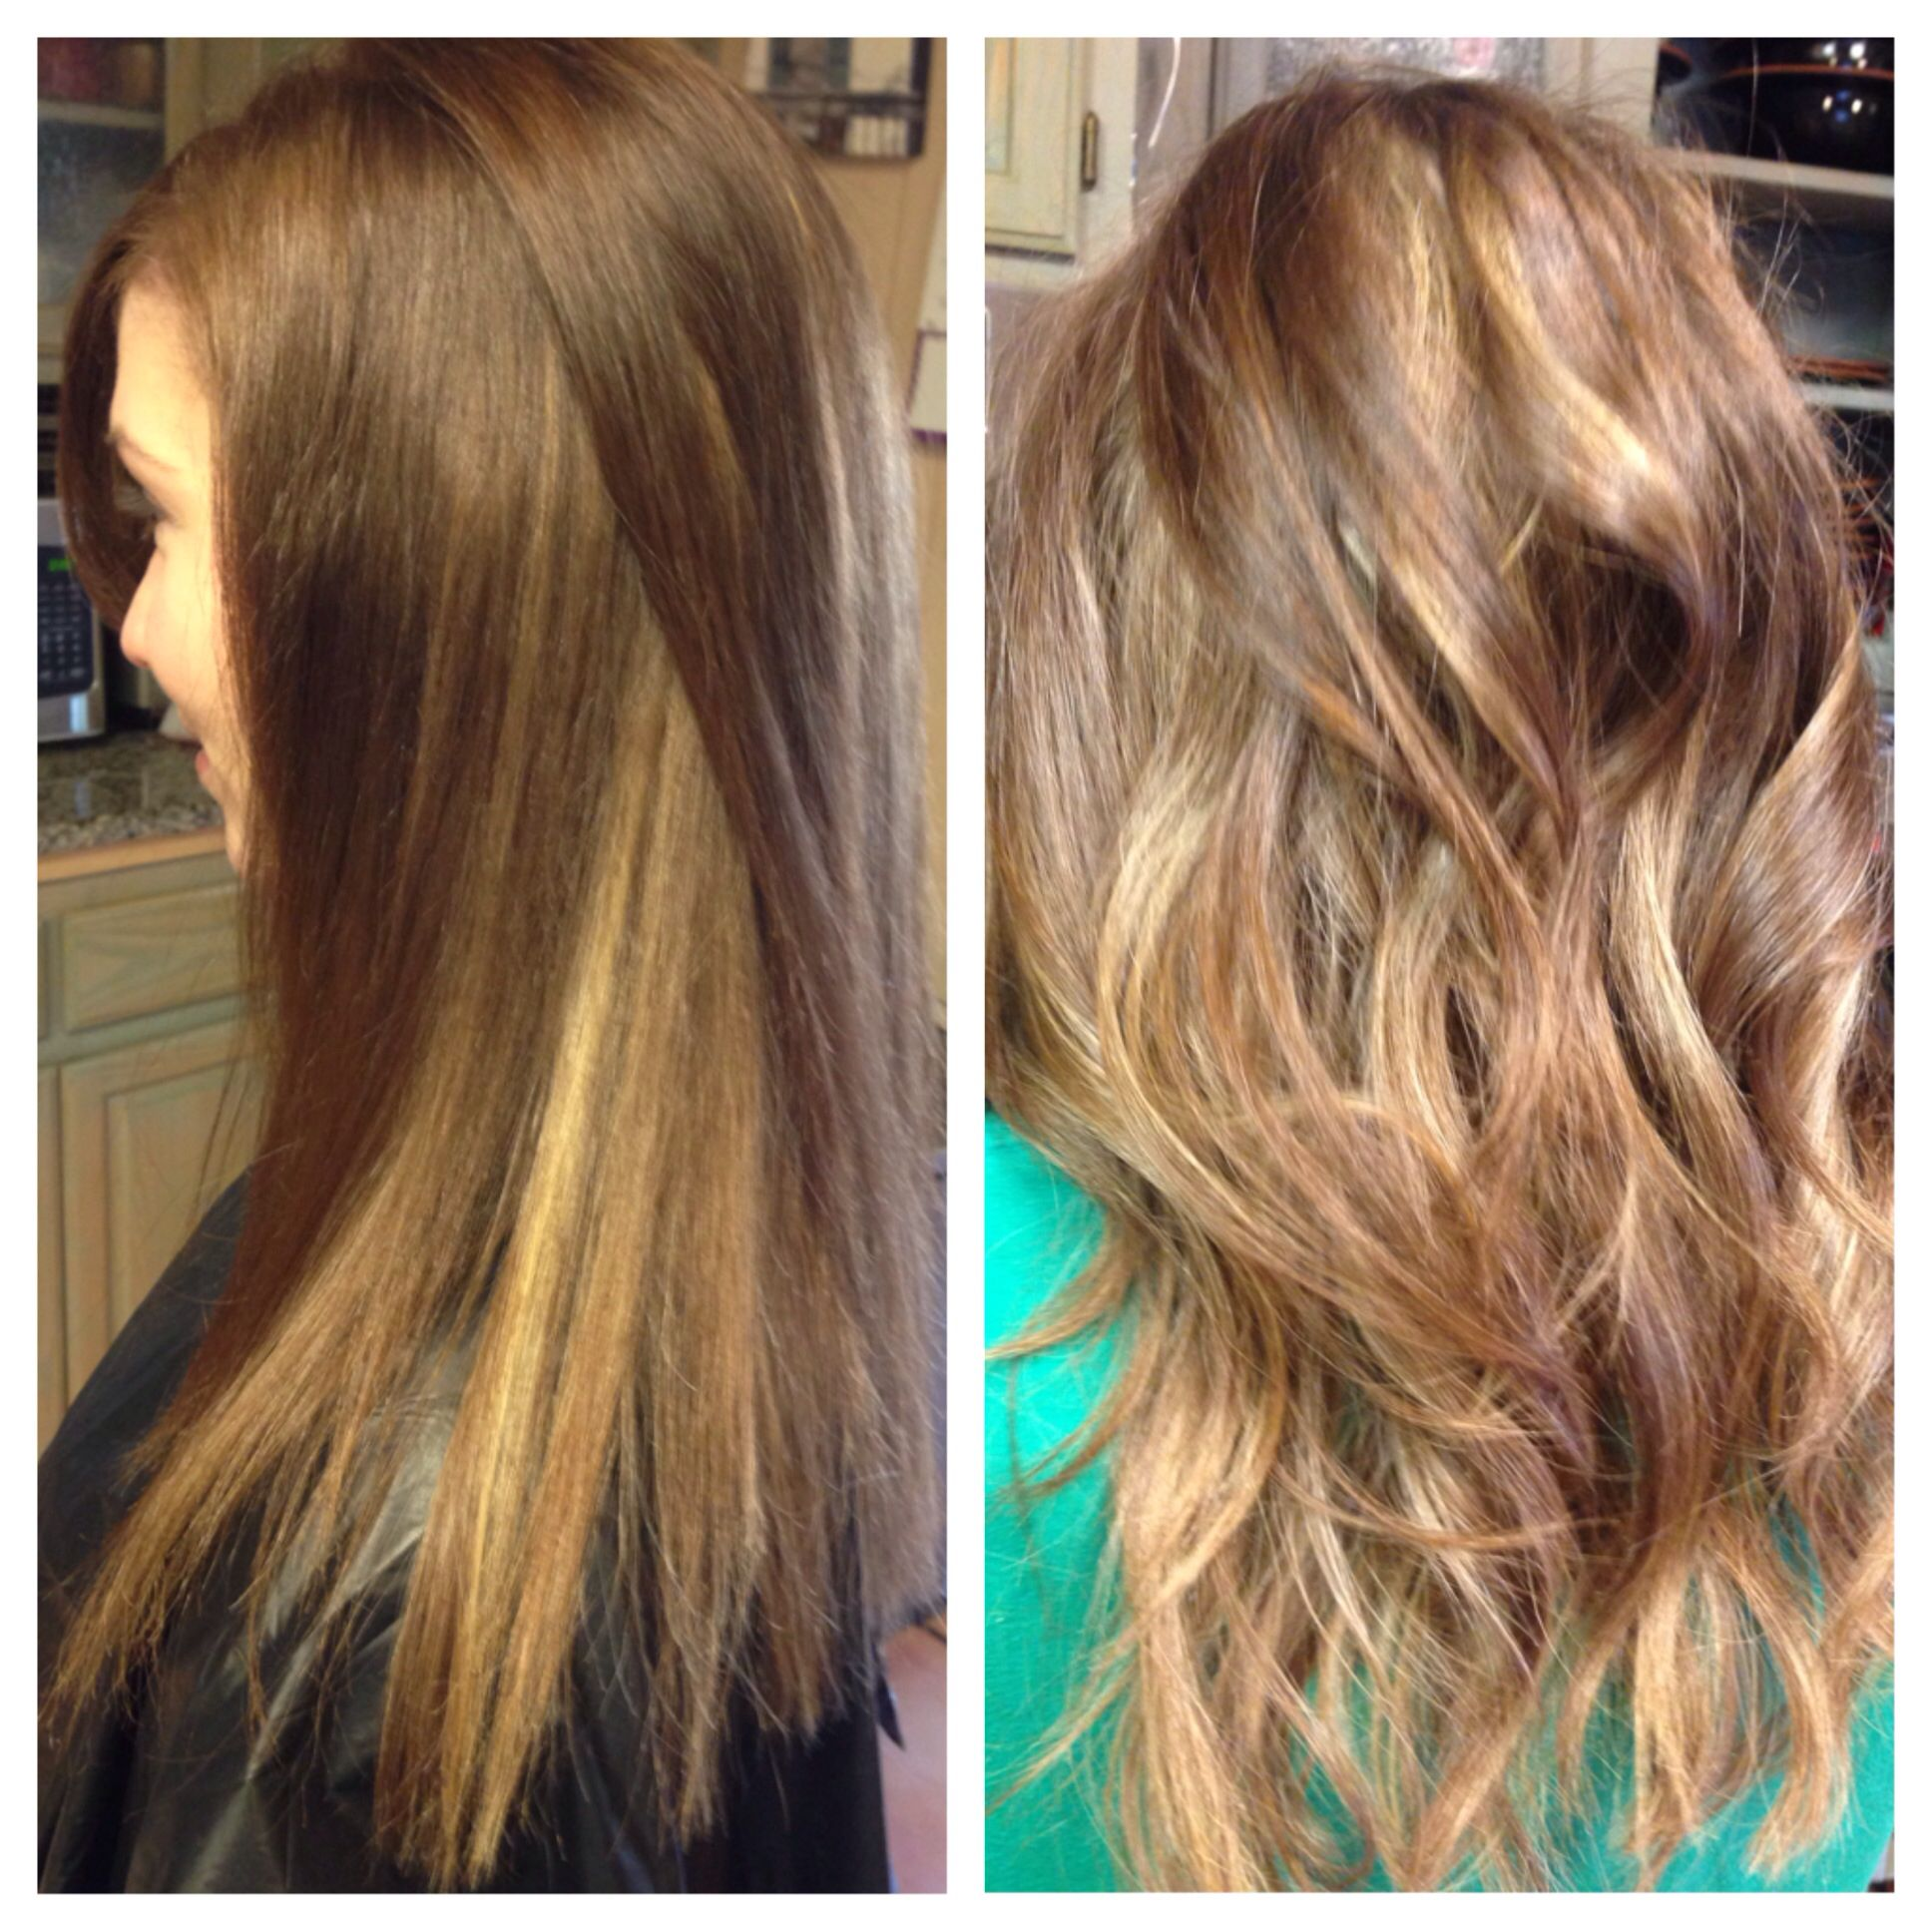 Peekaboo Highlights On Light Brown Hair Light Brown Hair